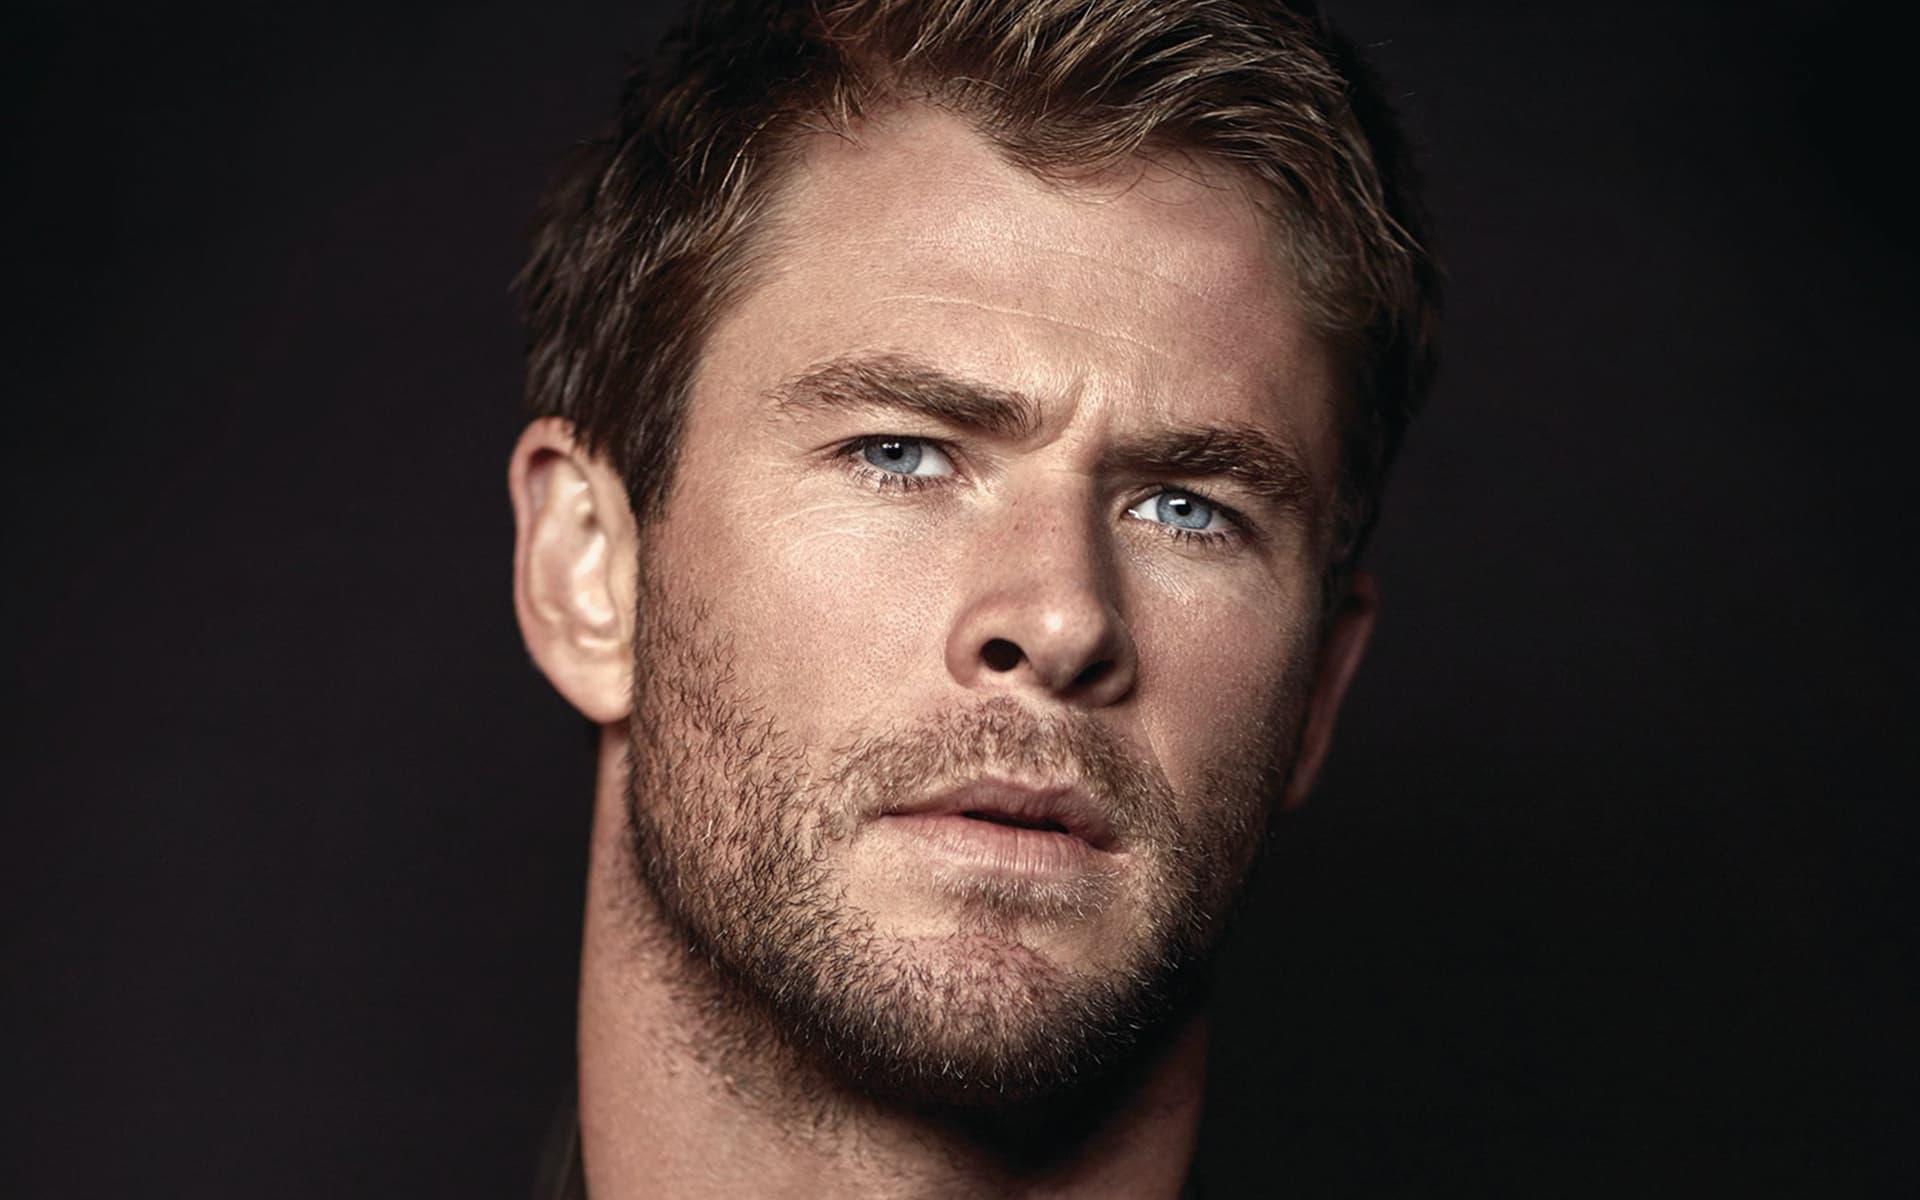 Fondos de Chris Hemsworth wallpapers Chris Hemsworth 1920x1200